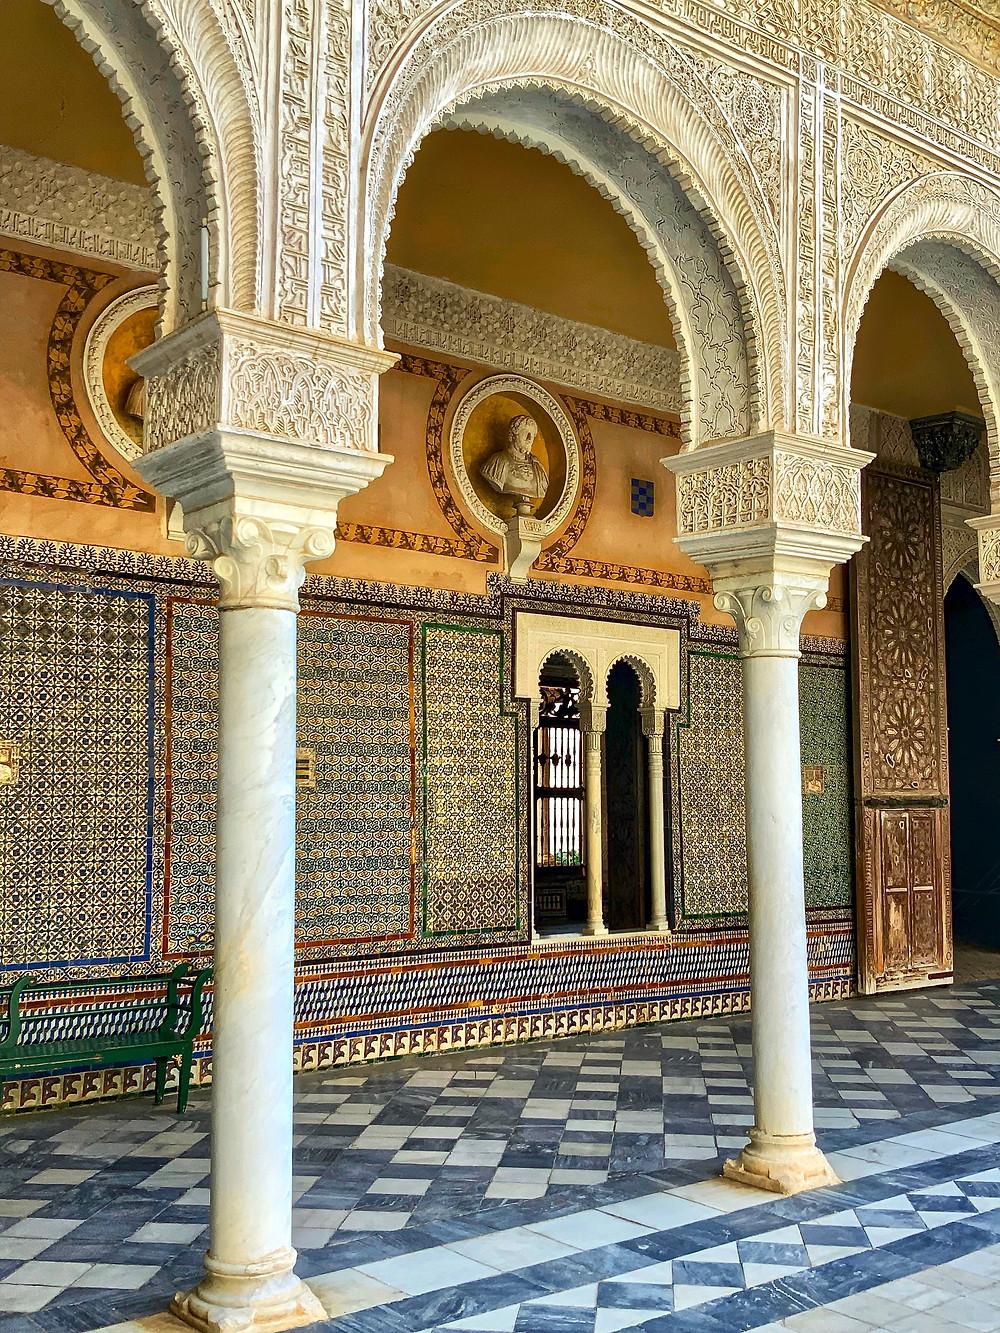 Mudejar arches and azulejo tiles in the courtyard of Casa de Pilatos